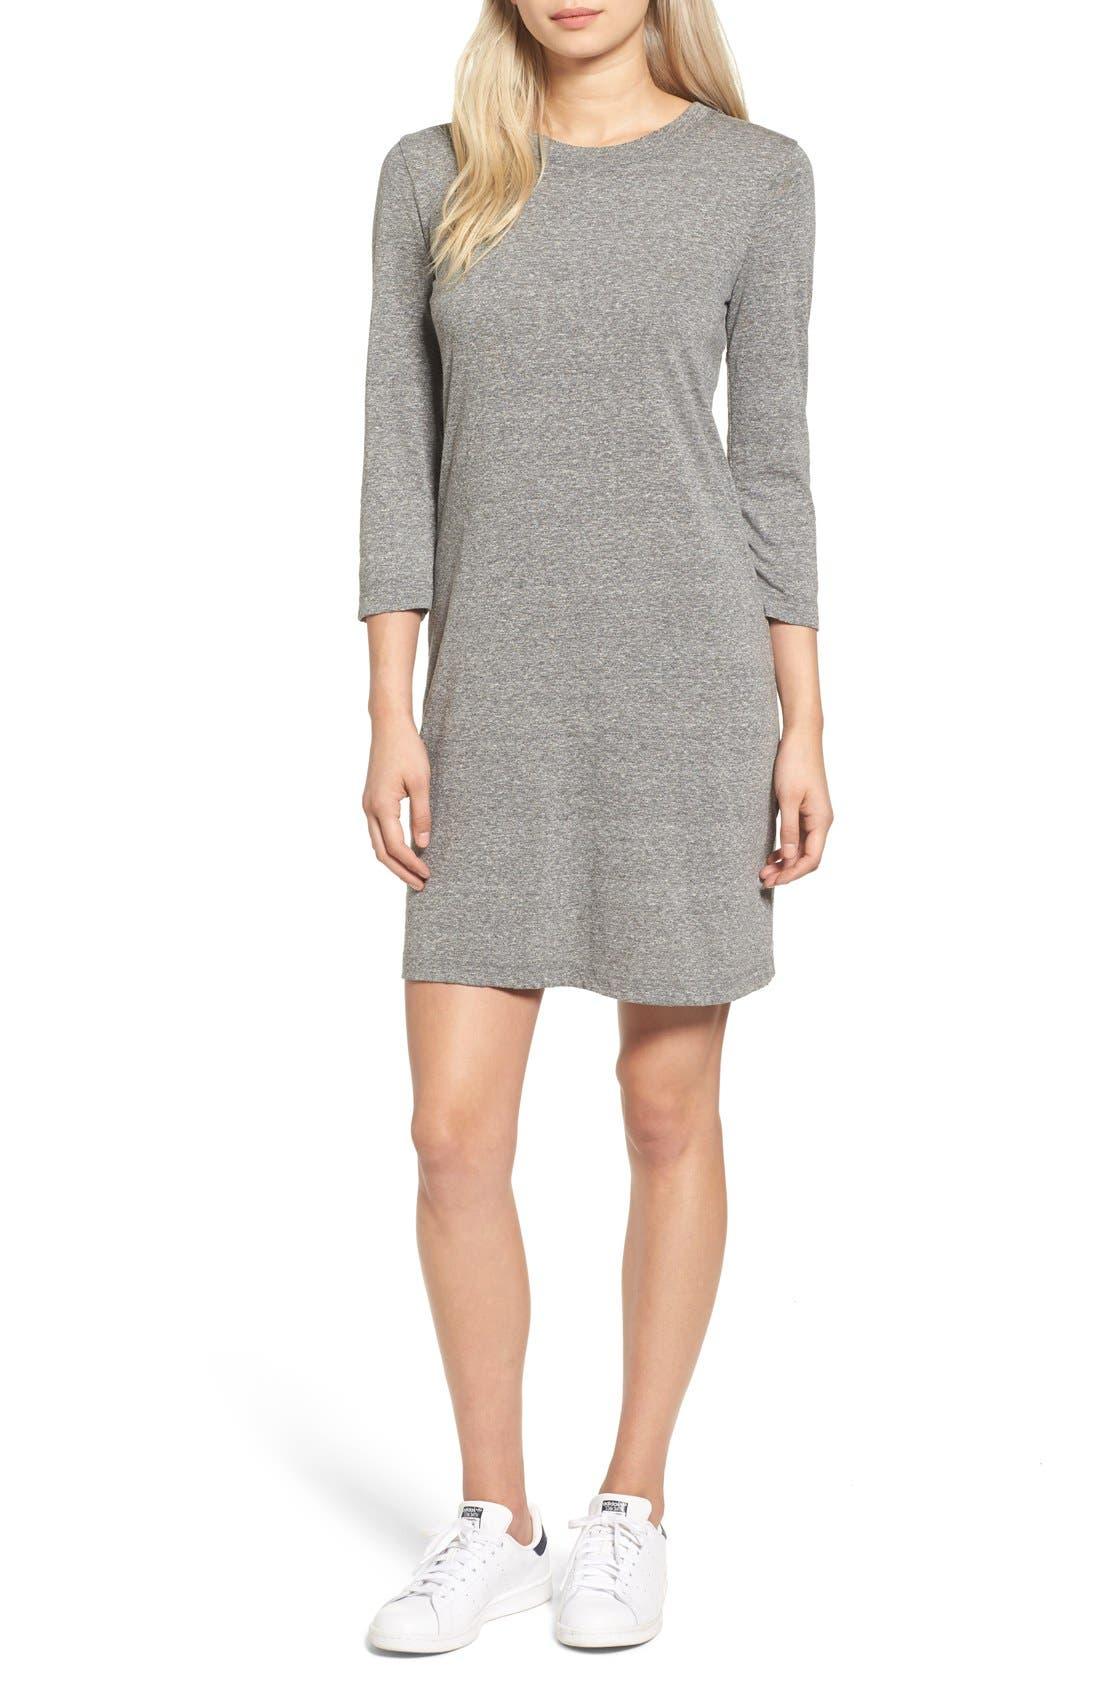 Current/Elliott T-Shirt Dress